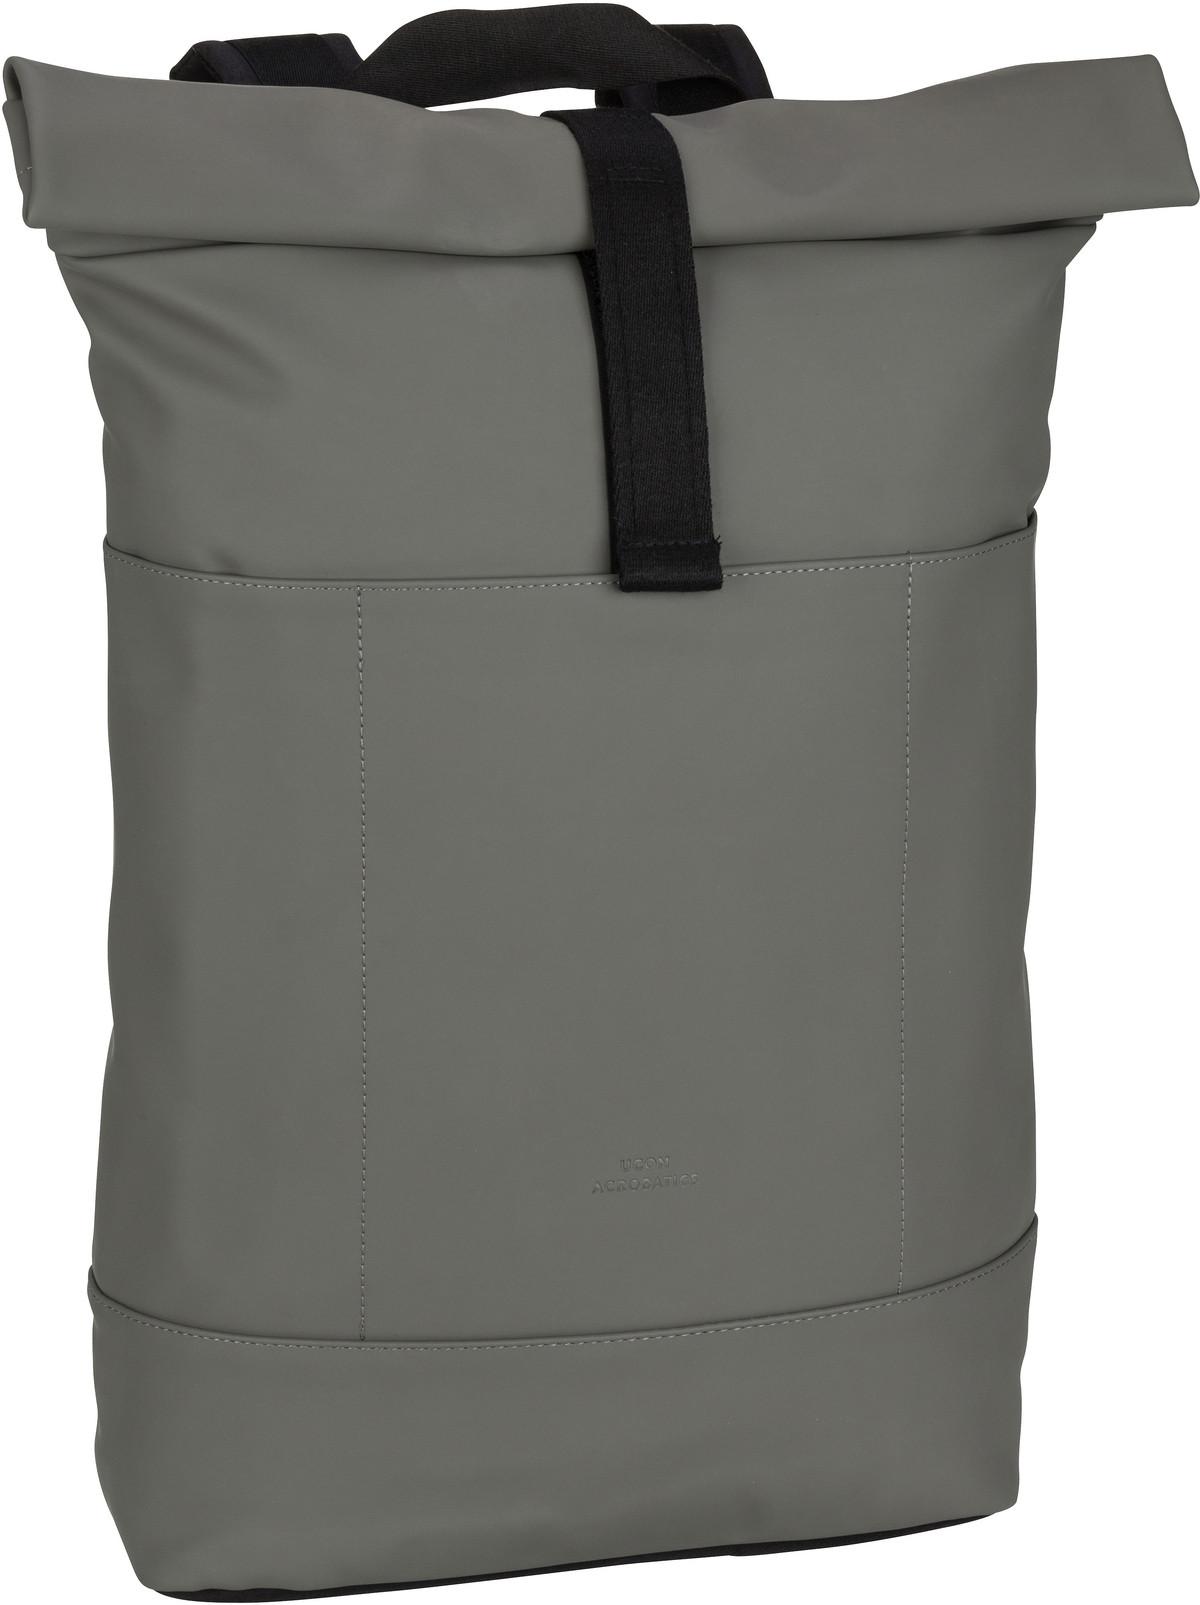 Laptoprucksack Lotus Hajo Backpack Dark Grey (20 Liter)